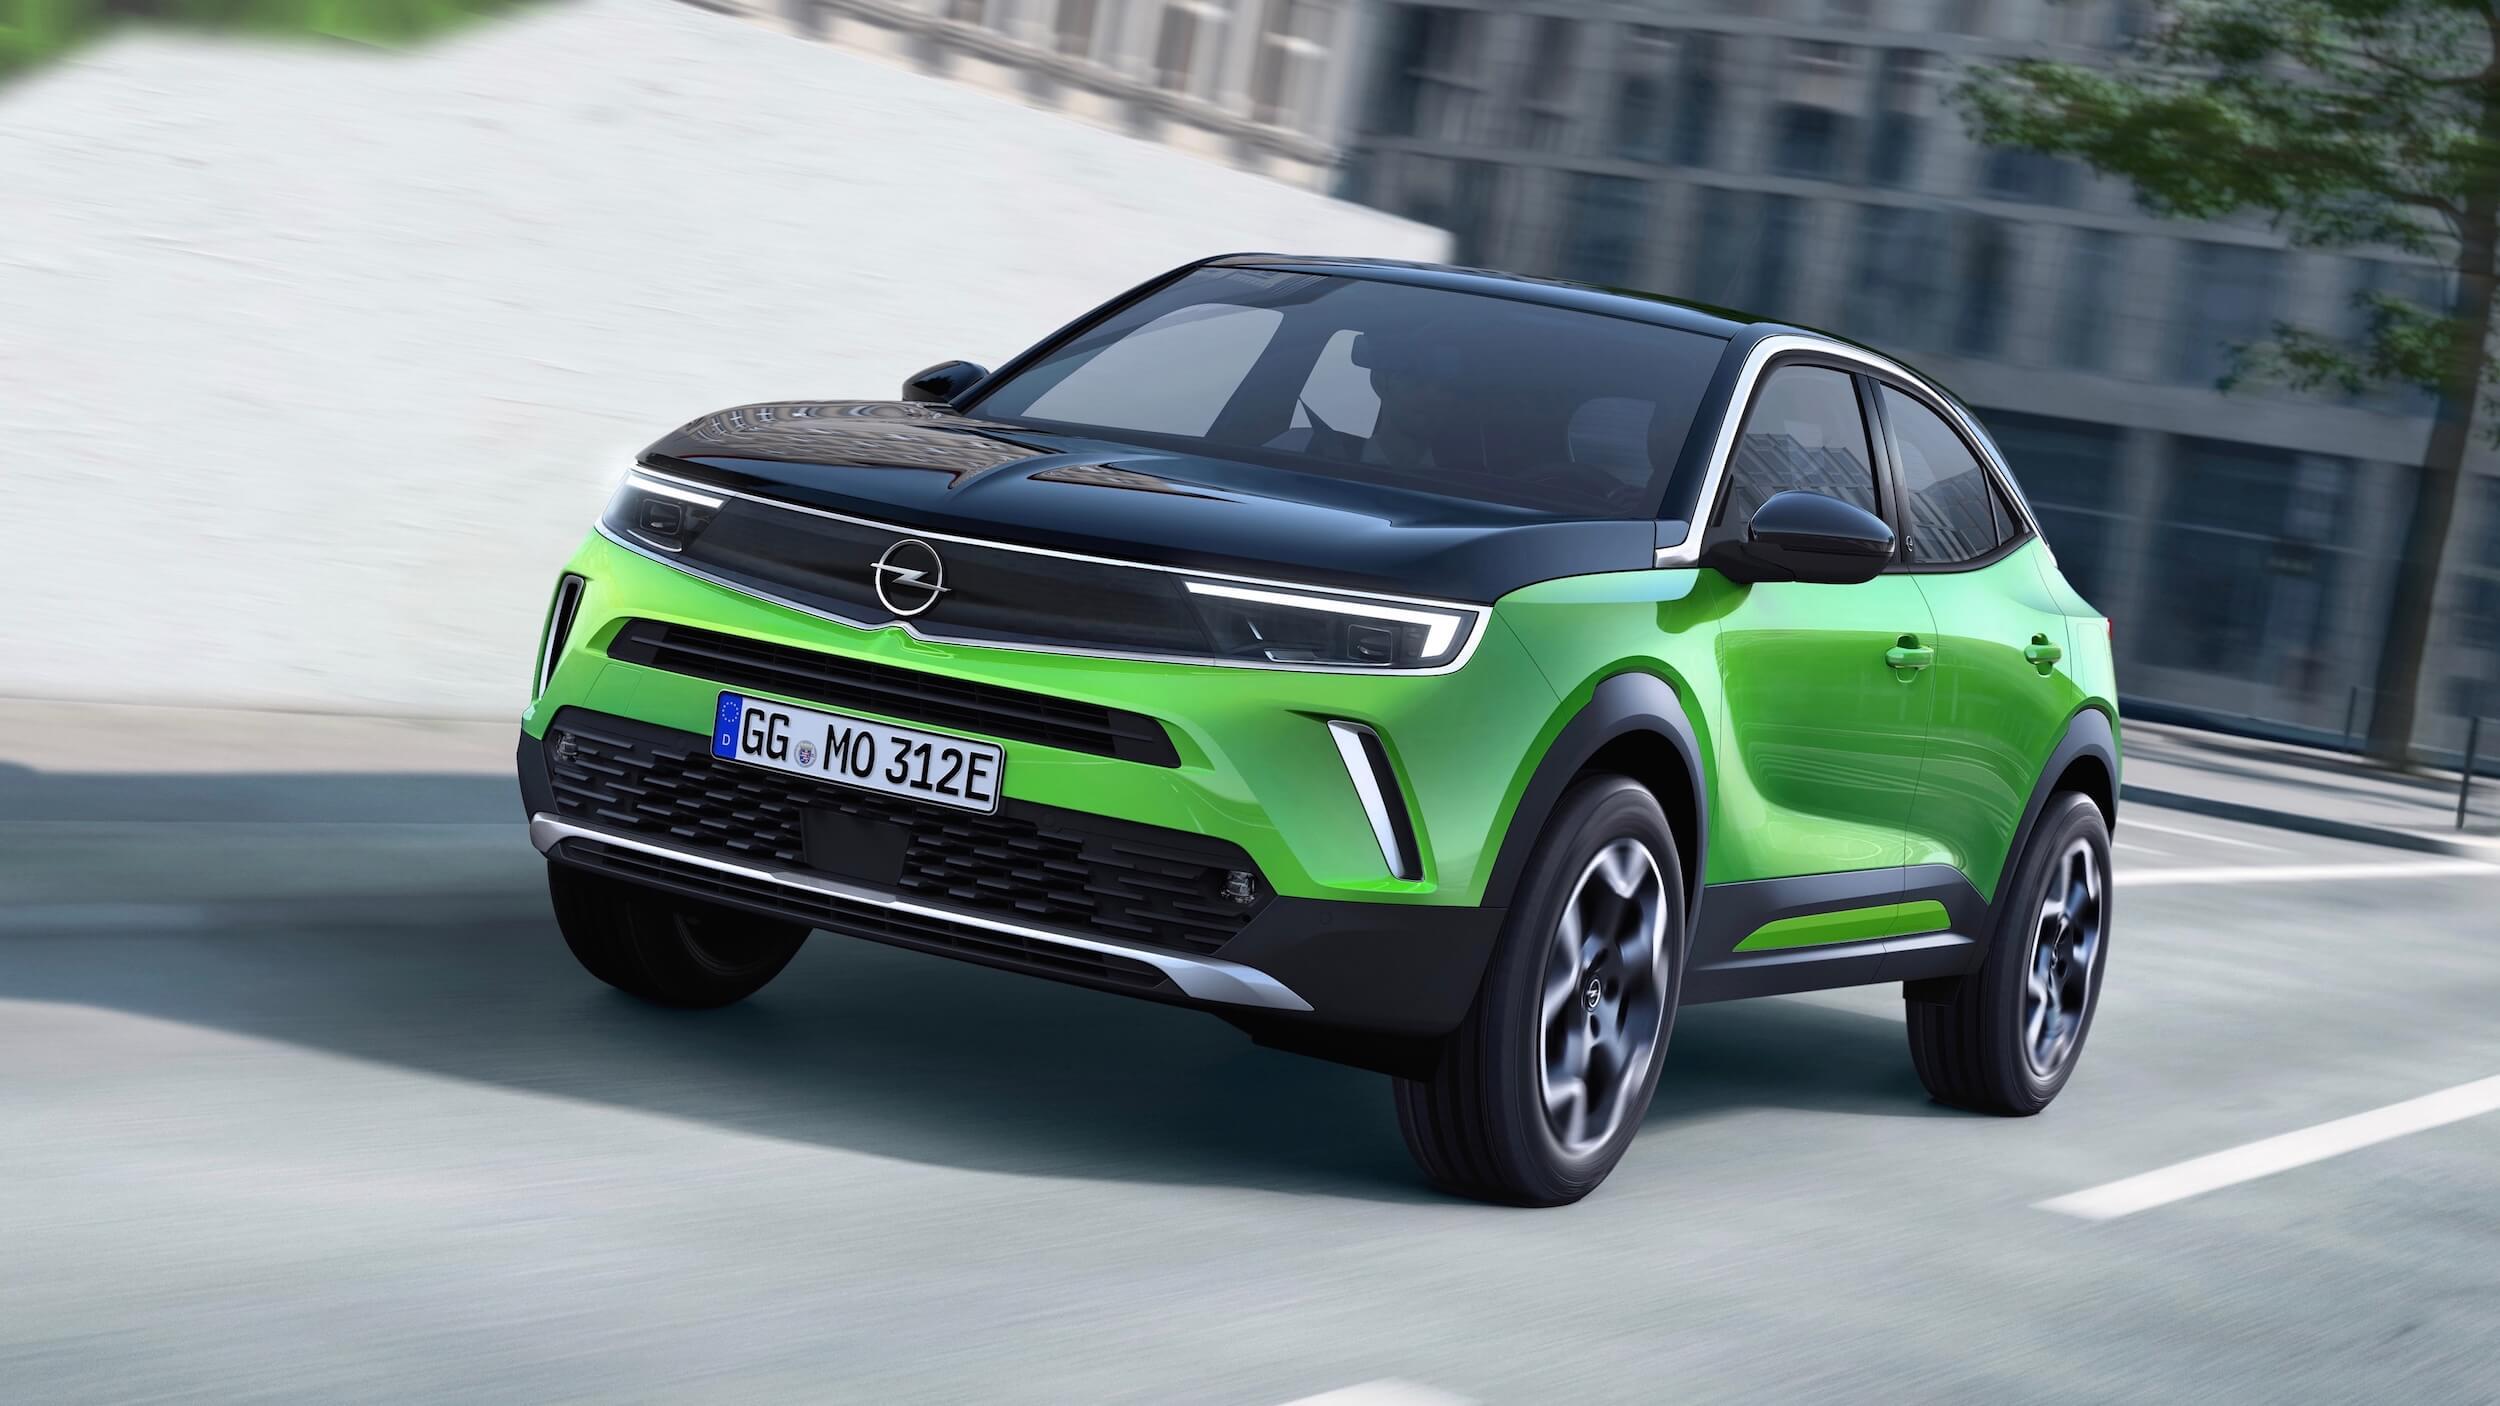 Opel Mokka e elektrisch voertuig